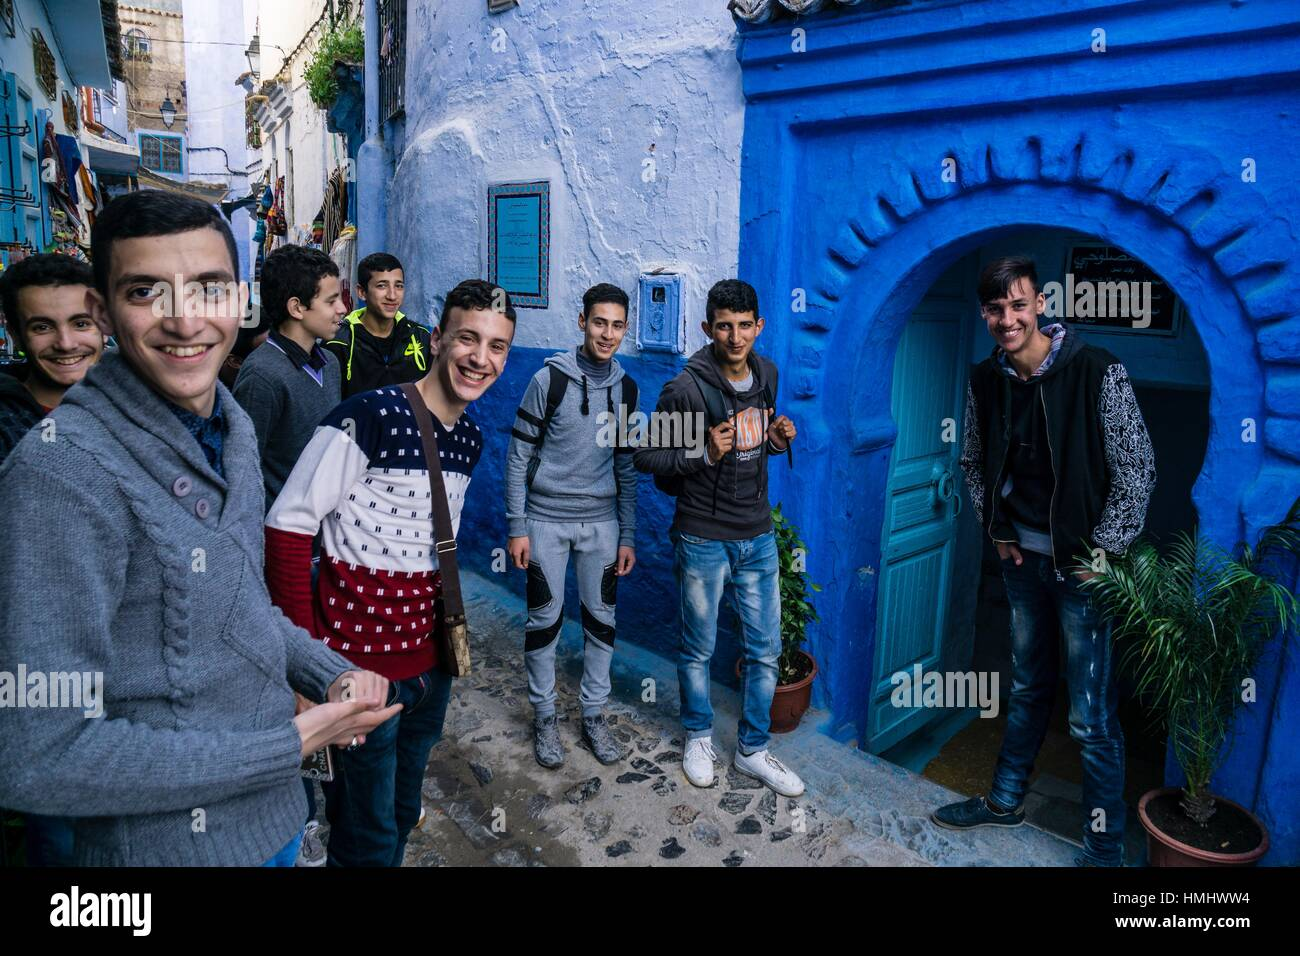 Estudiantes de Tetuán visitando la medina, Chauen Chefchauen, --, Marruecos, Norte de África. Foto de stock